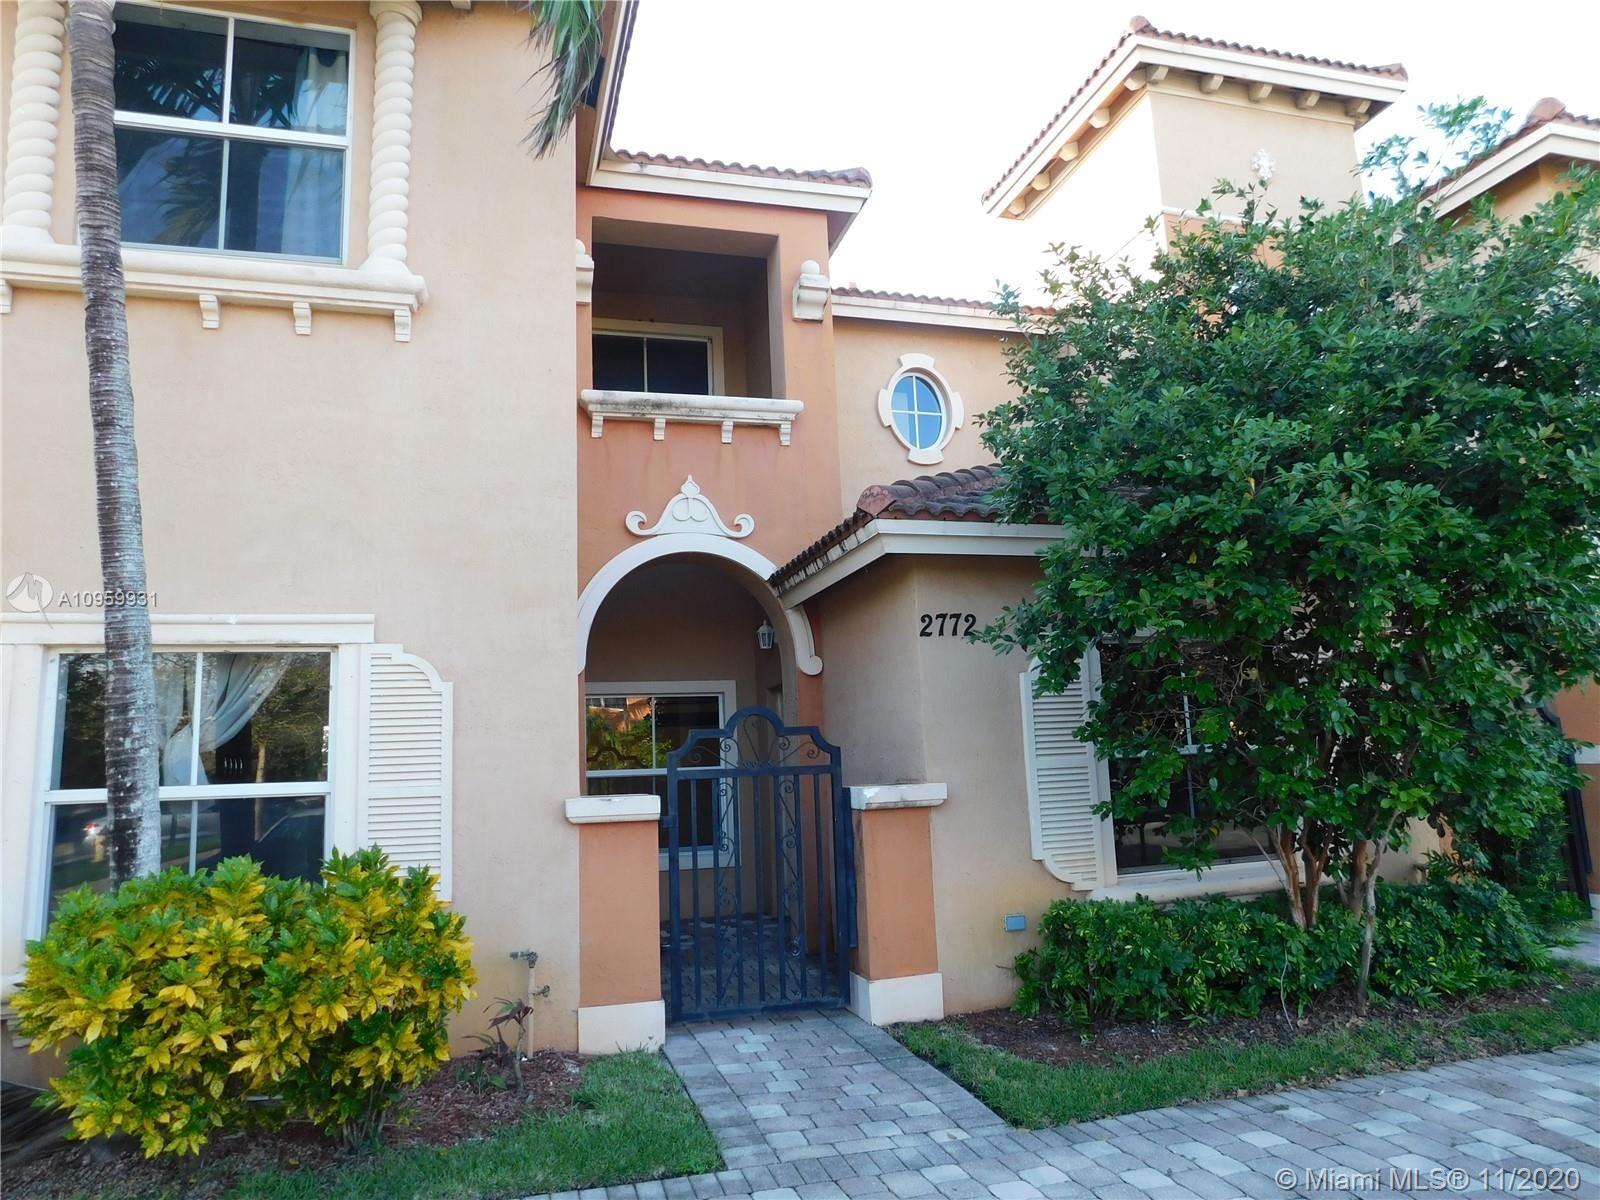 2772 SW 121st Ave #602, Miramar, FL 33025 - #: A10959931